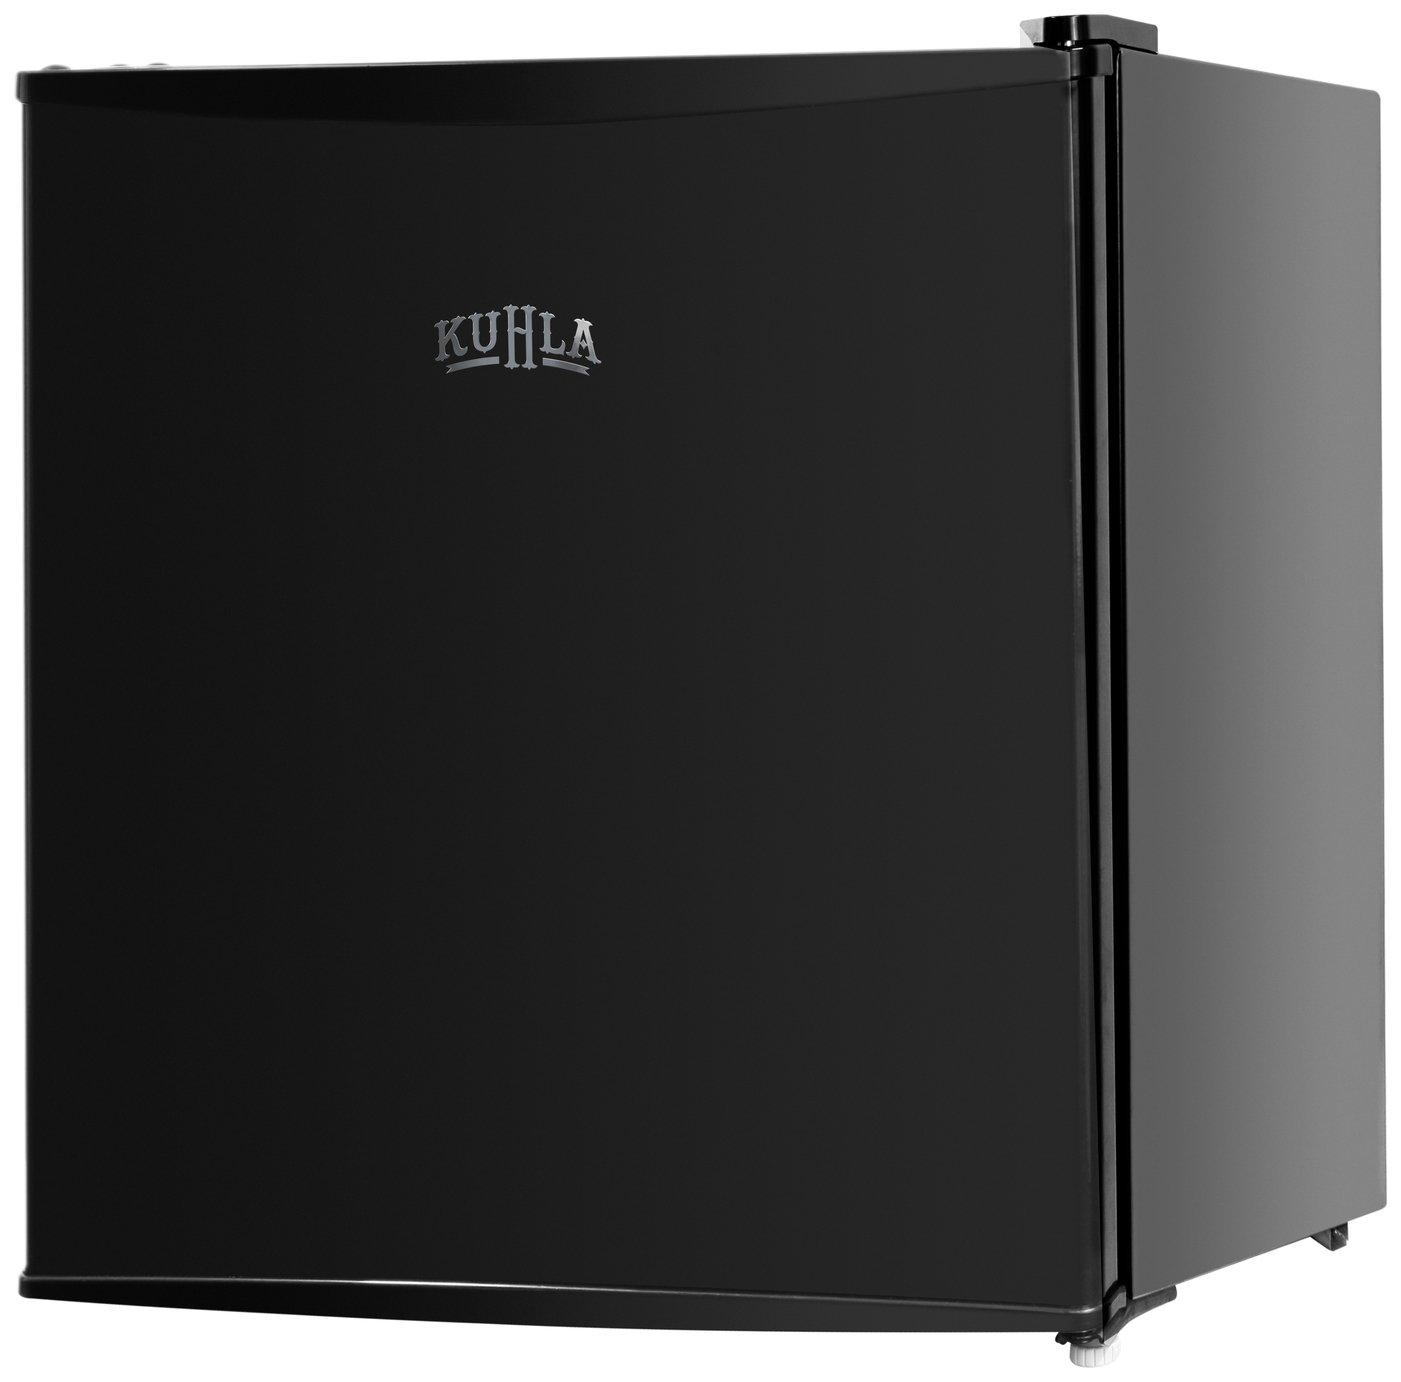 Kuhla KTT4BGB Table Top Fridge - Black